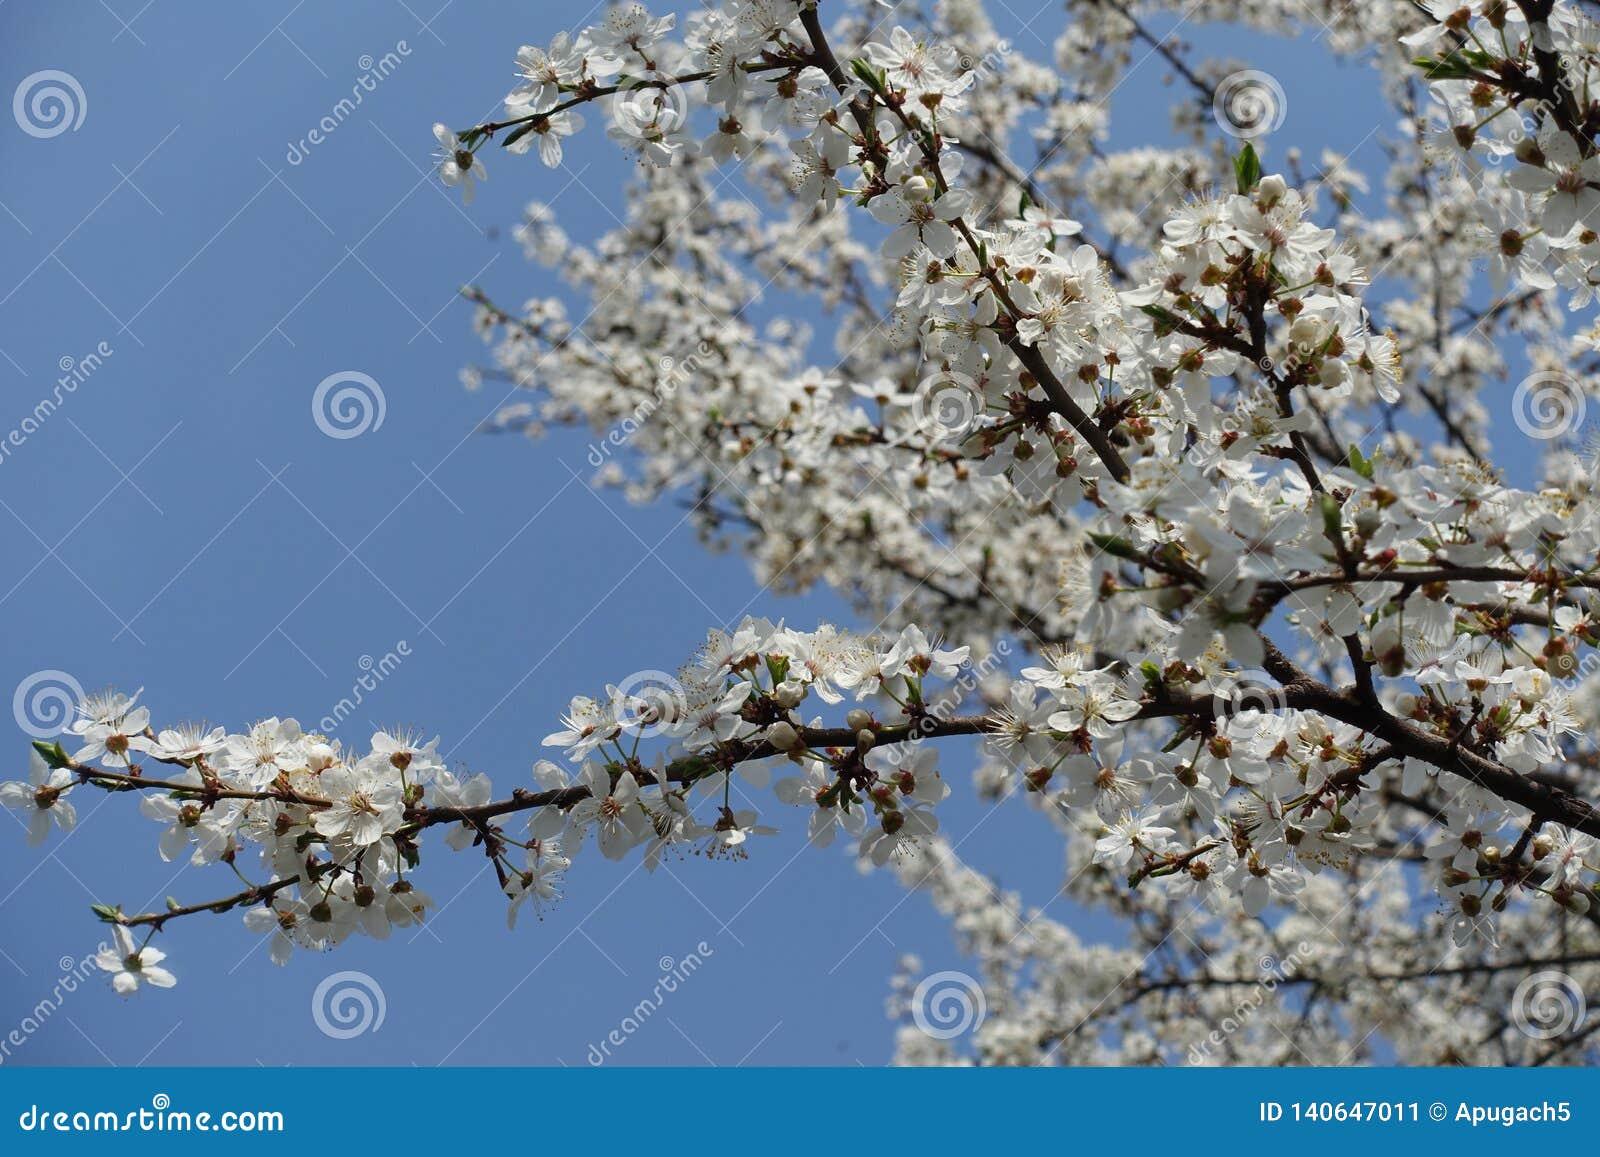 Slanted branch of blossoming Prunus cerasifera against blue sky